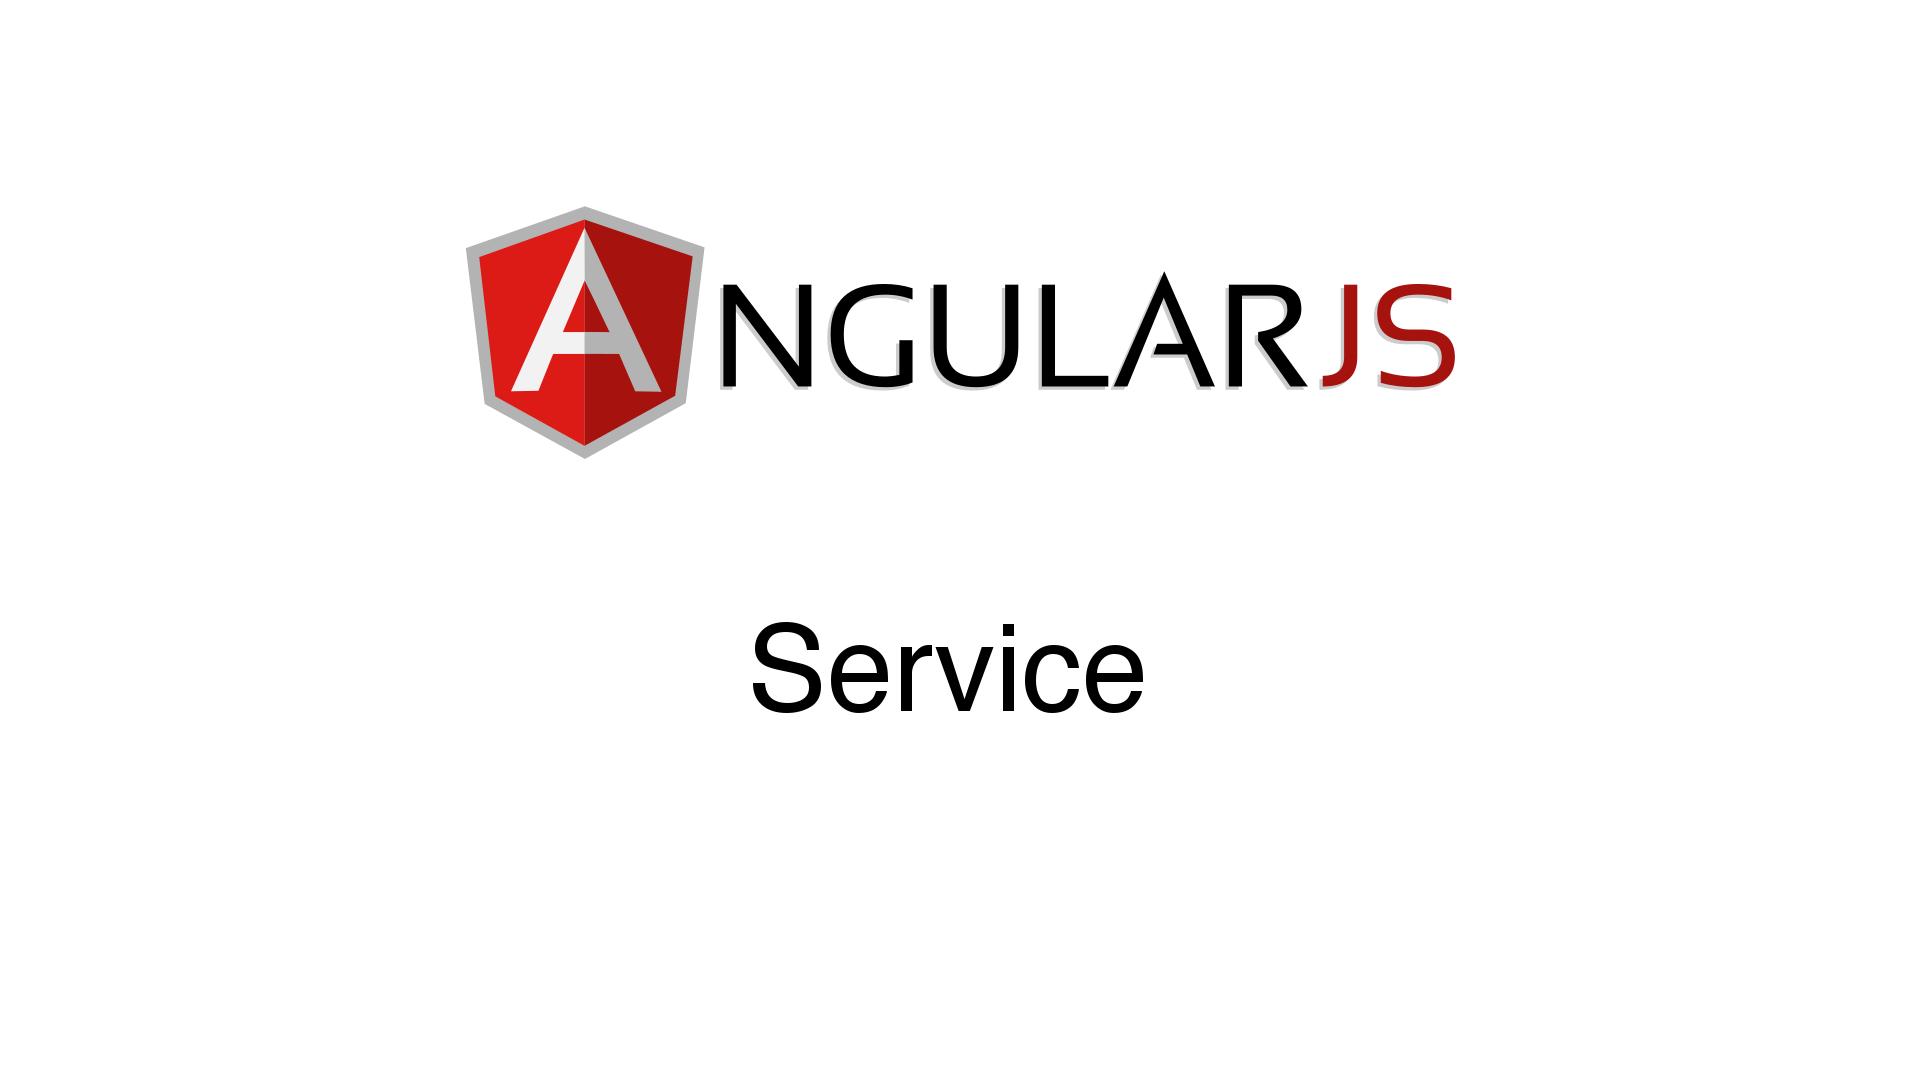 AngularJS - Service